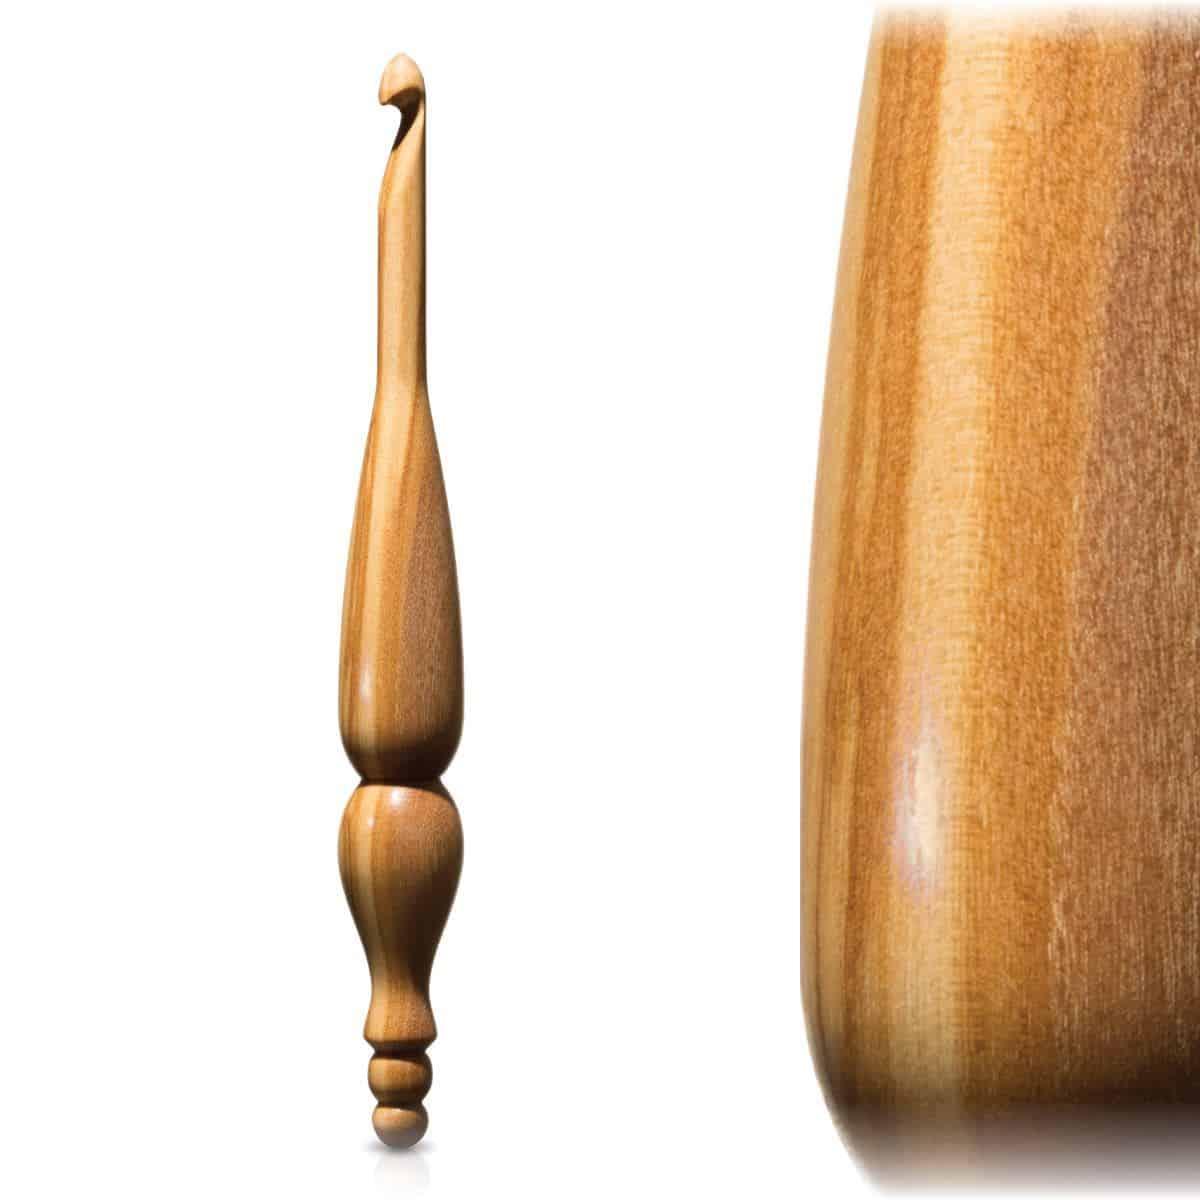 Furls Handmade Wood Crochet Hooks - Ergonomic. Beautiful. Alpha Series